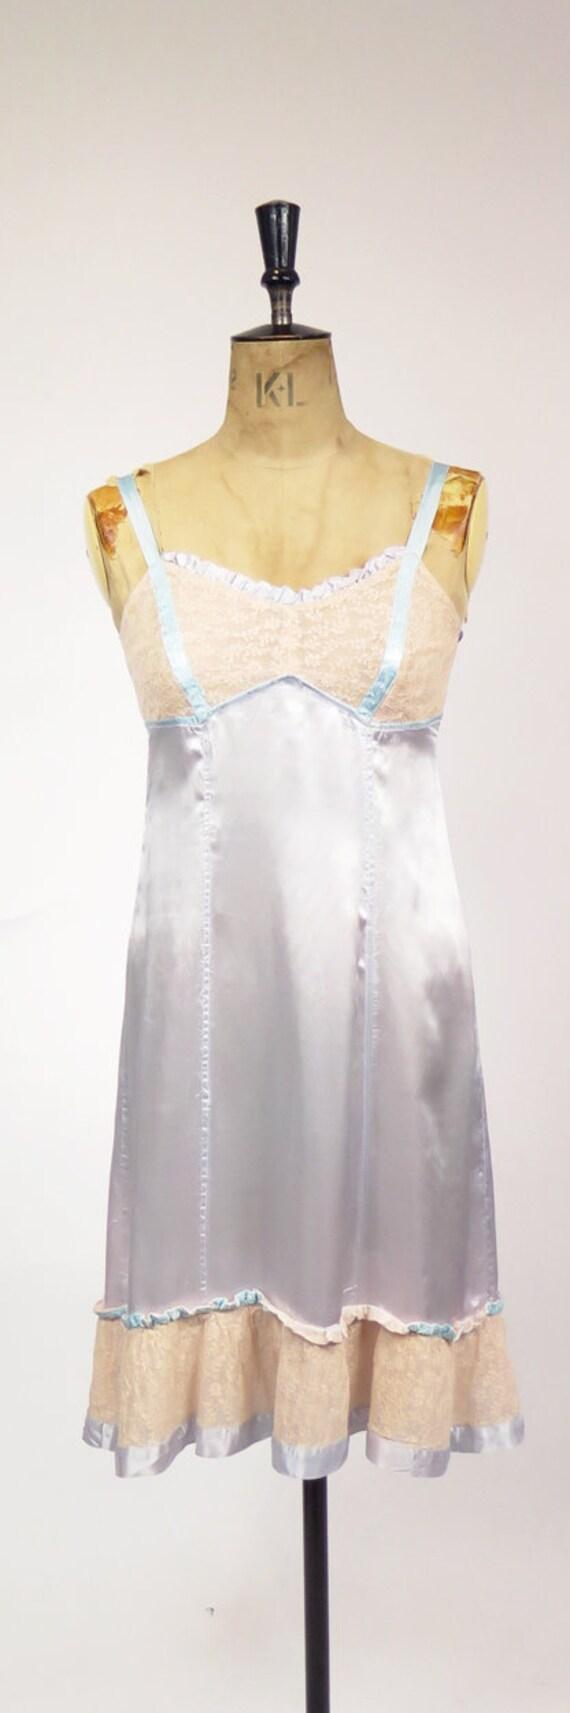 Original Vintage 1940-50s Dusky Blue Nude Lace Sl… - image 5